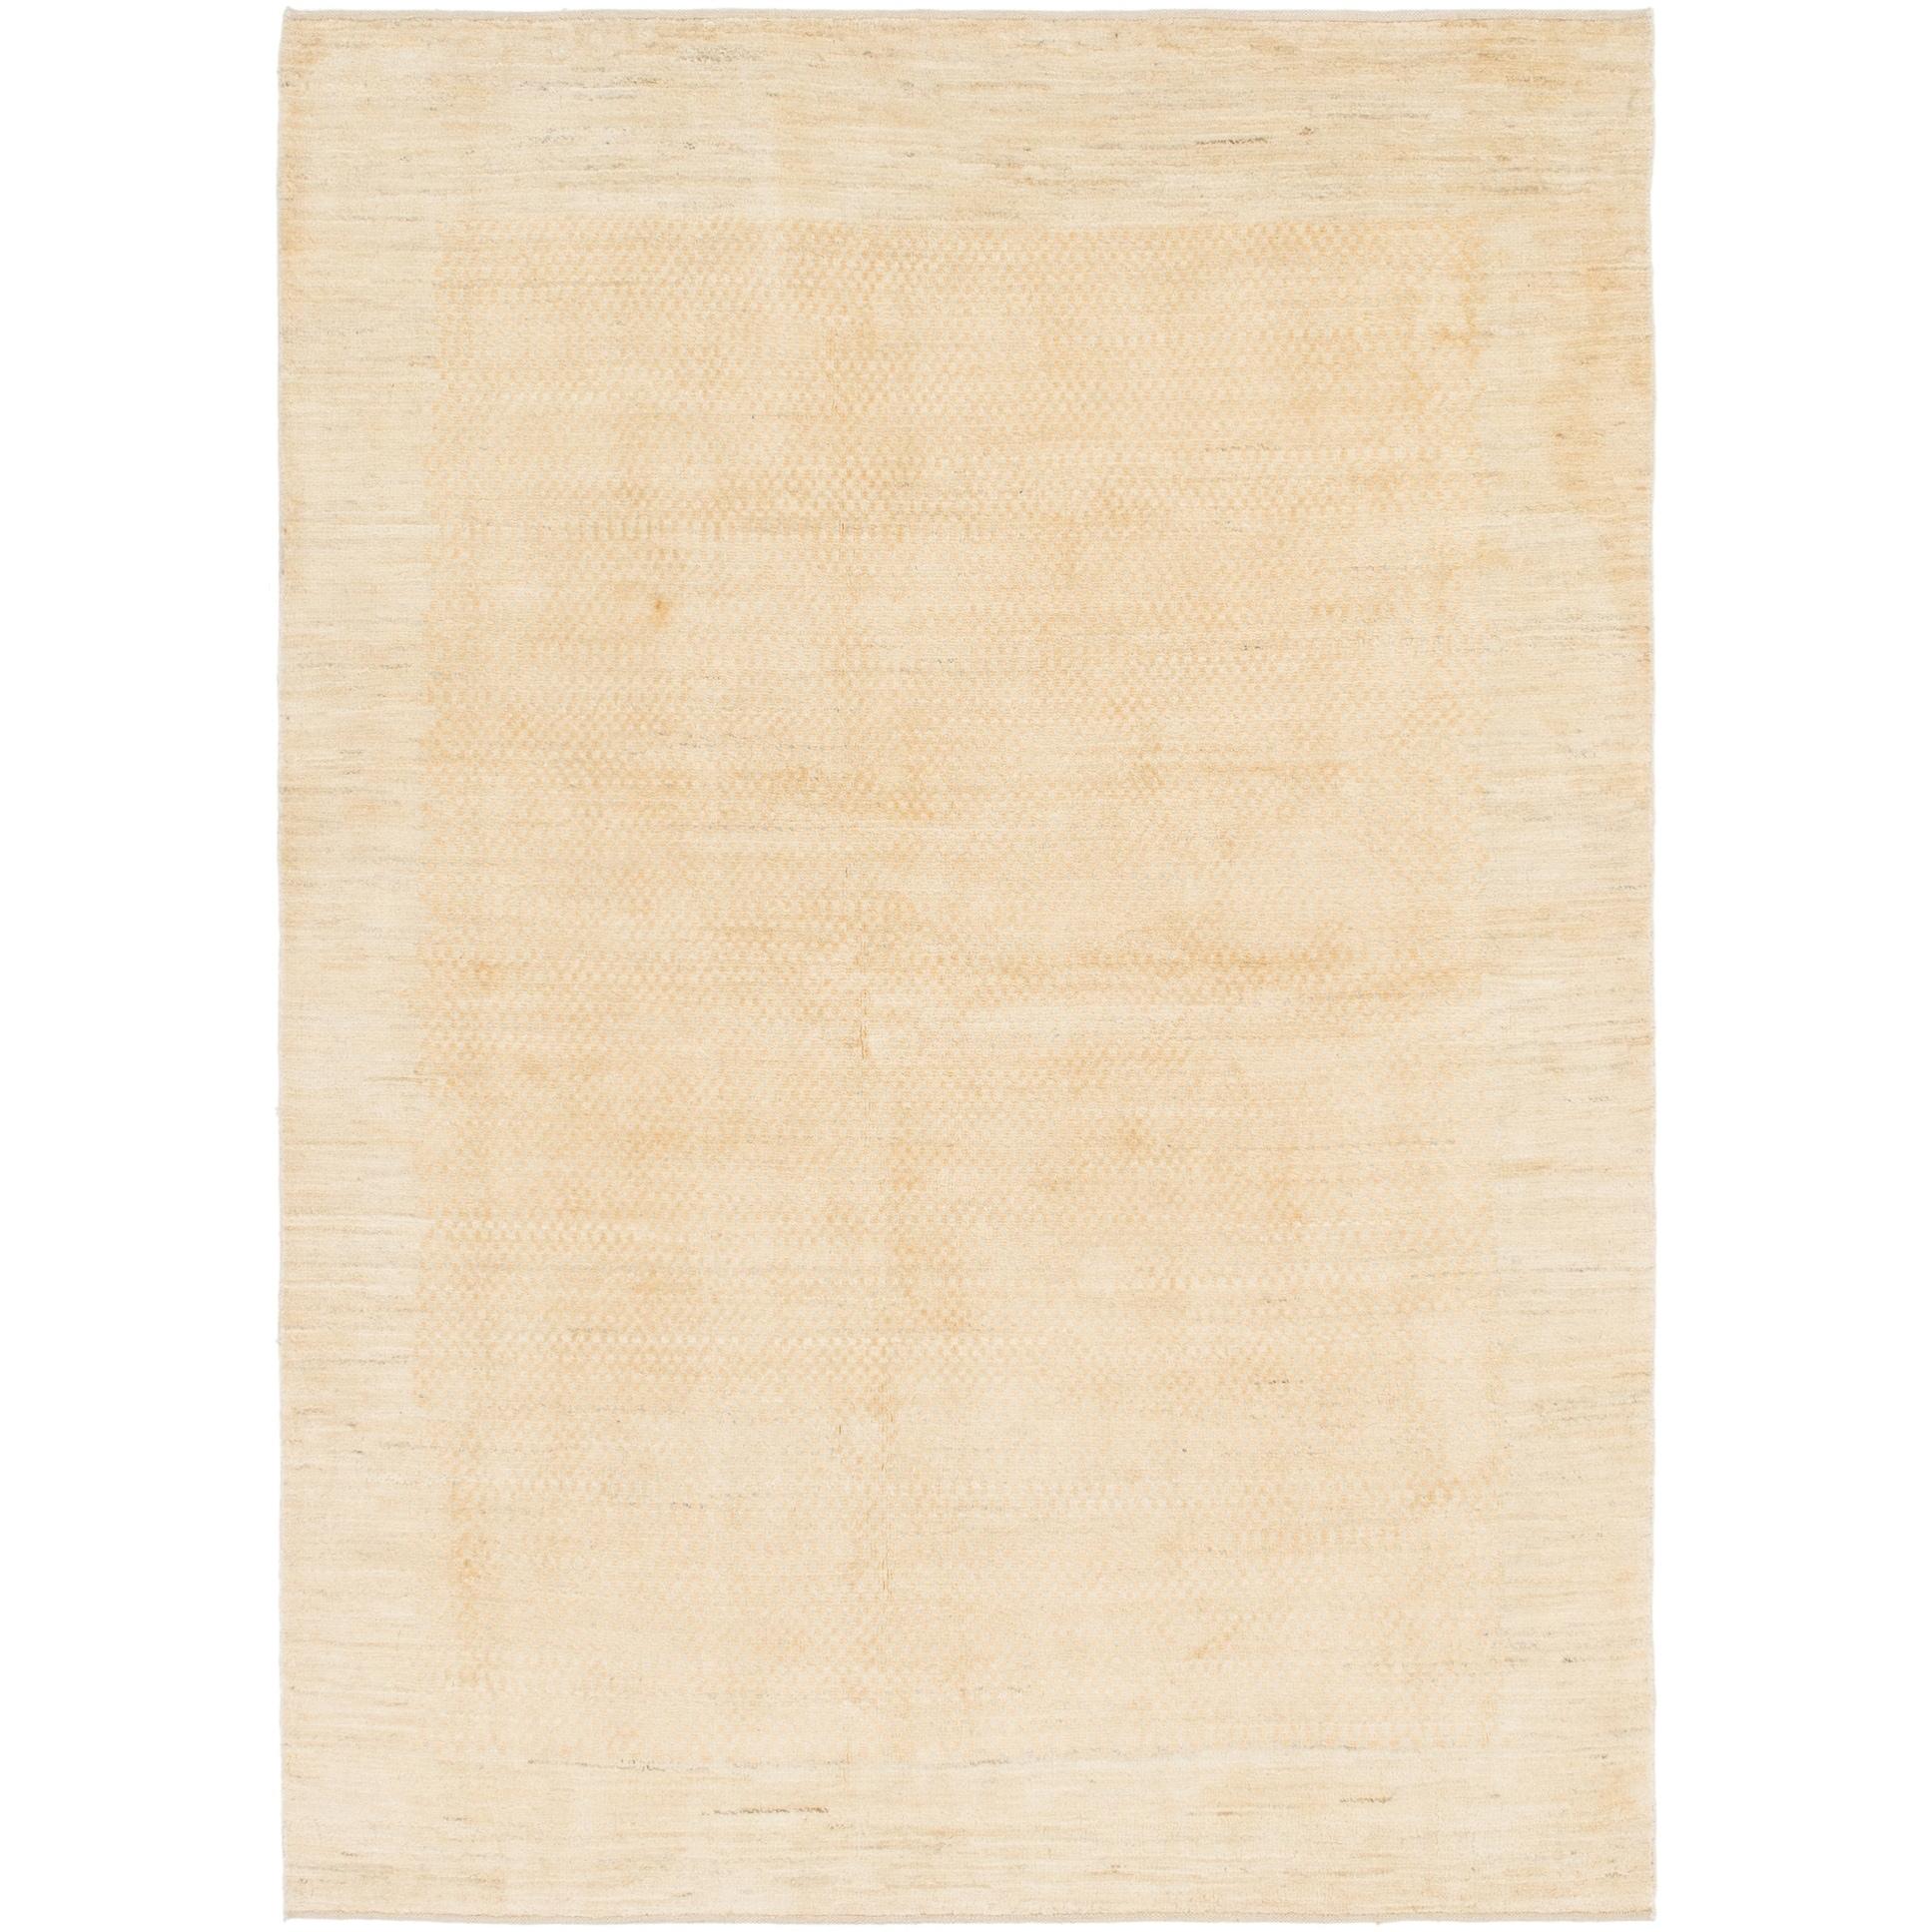 Hand Knotted Kashkuli Gabbeh Wool Area Rug - 5 7 x 7 10 (Gold - 5 7 x 7 10)